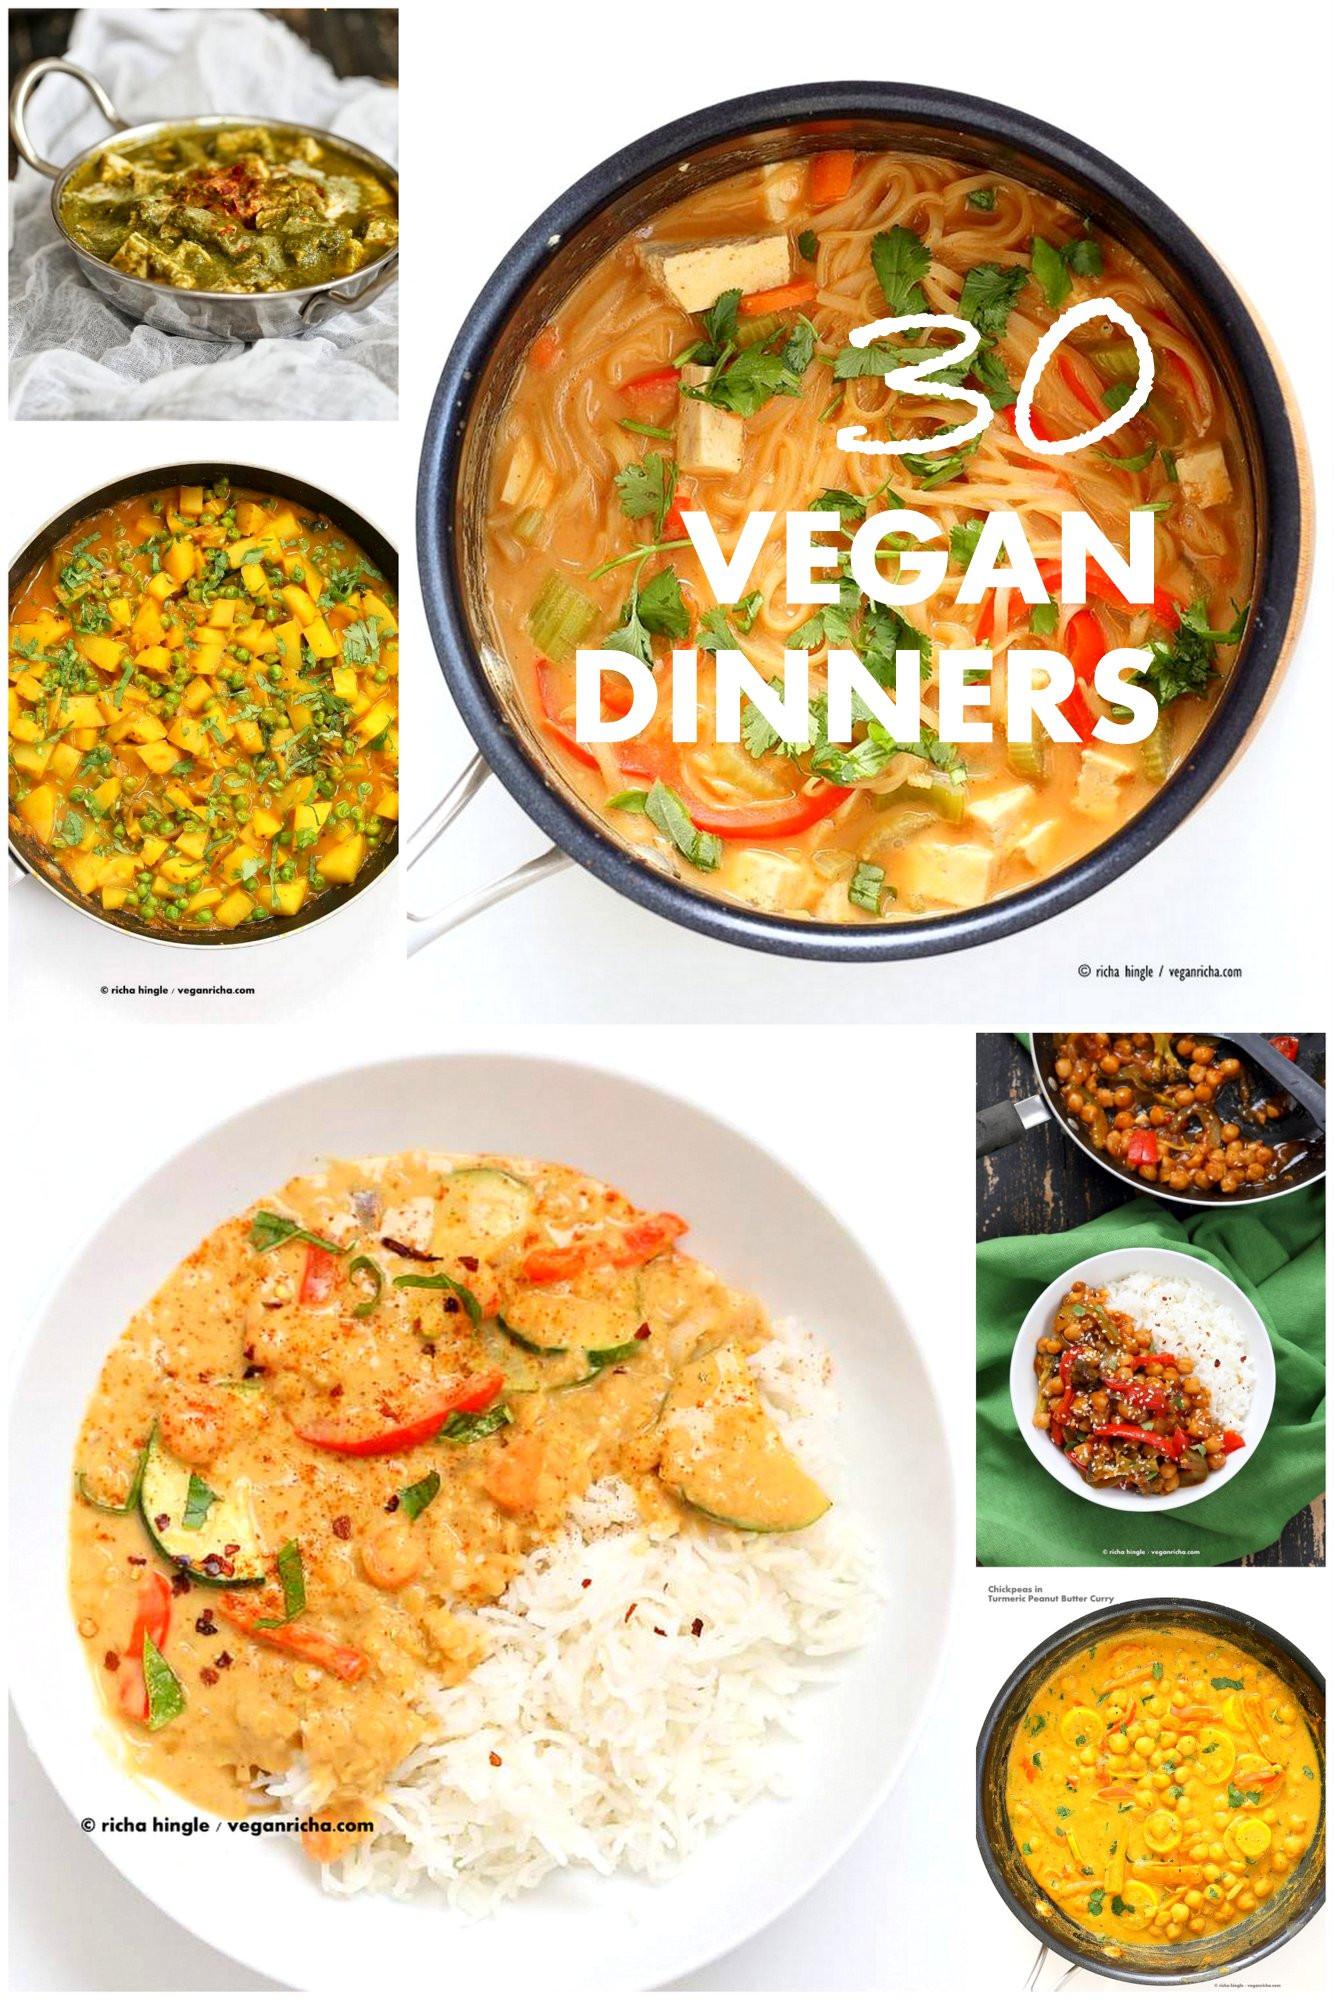 Simple Vegan Recipes  30 Easy Vegan Dinner Recipes Vegan Richa